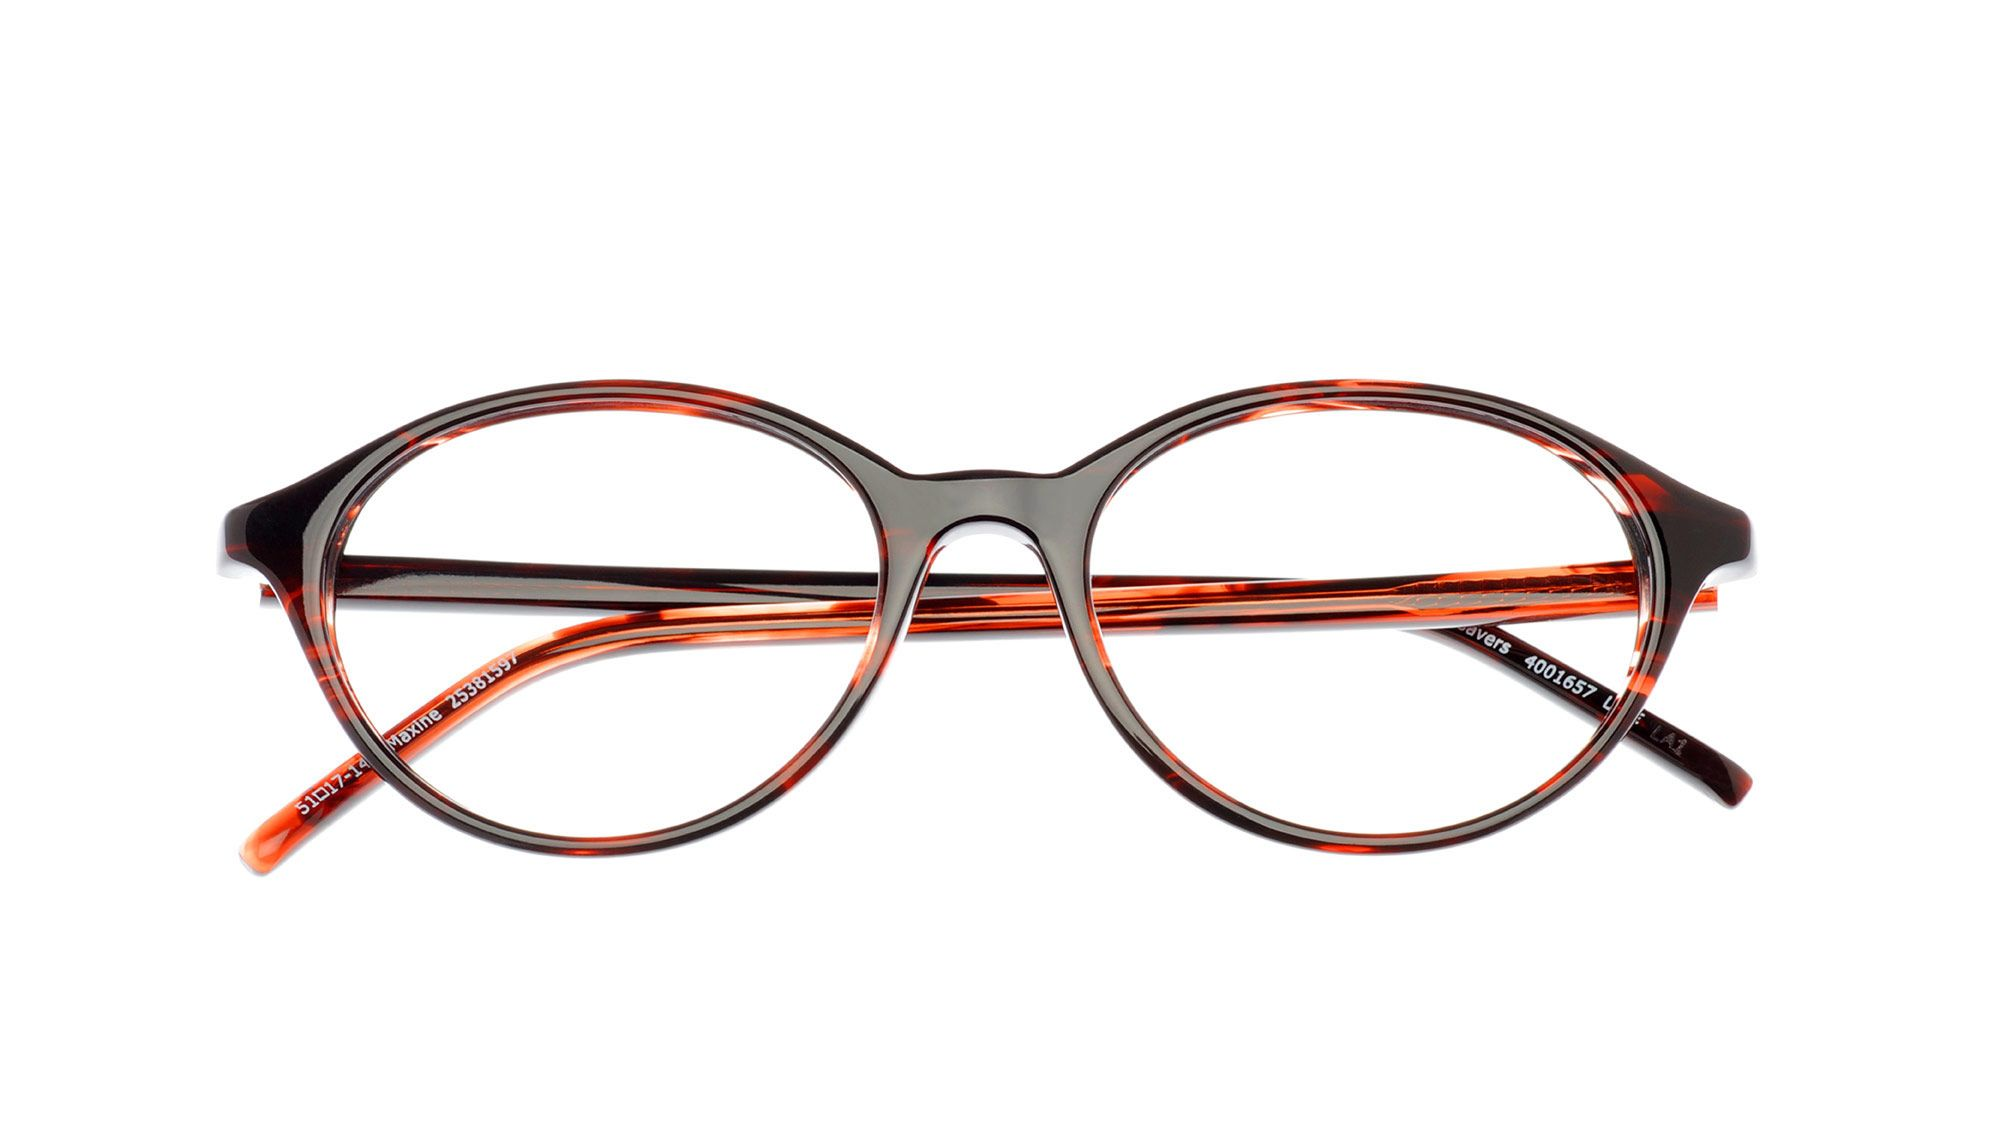 maxine silm auml lasit specsavers specsavers optikko inspiration maxine silmaumllasit specsavers specsavers optikko